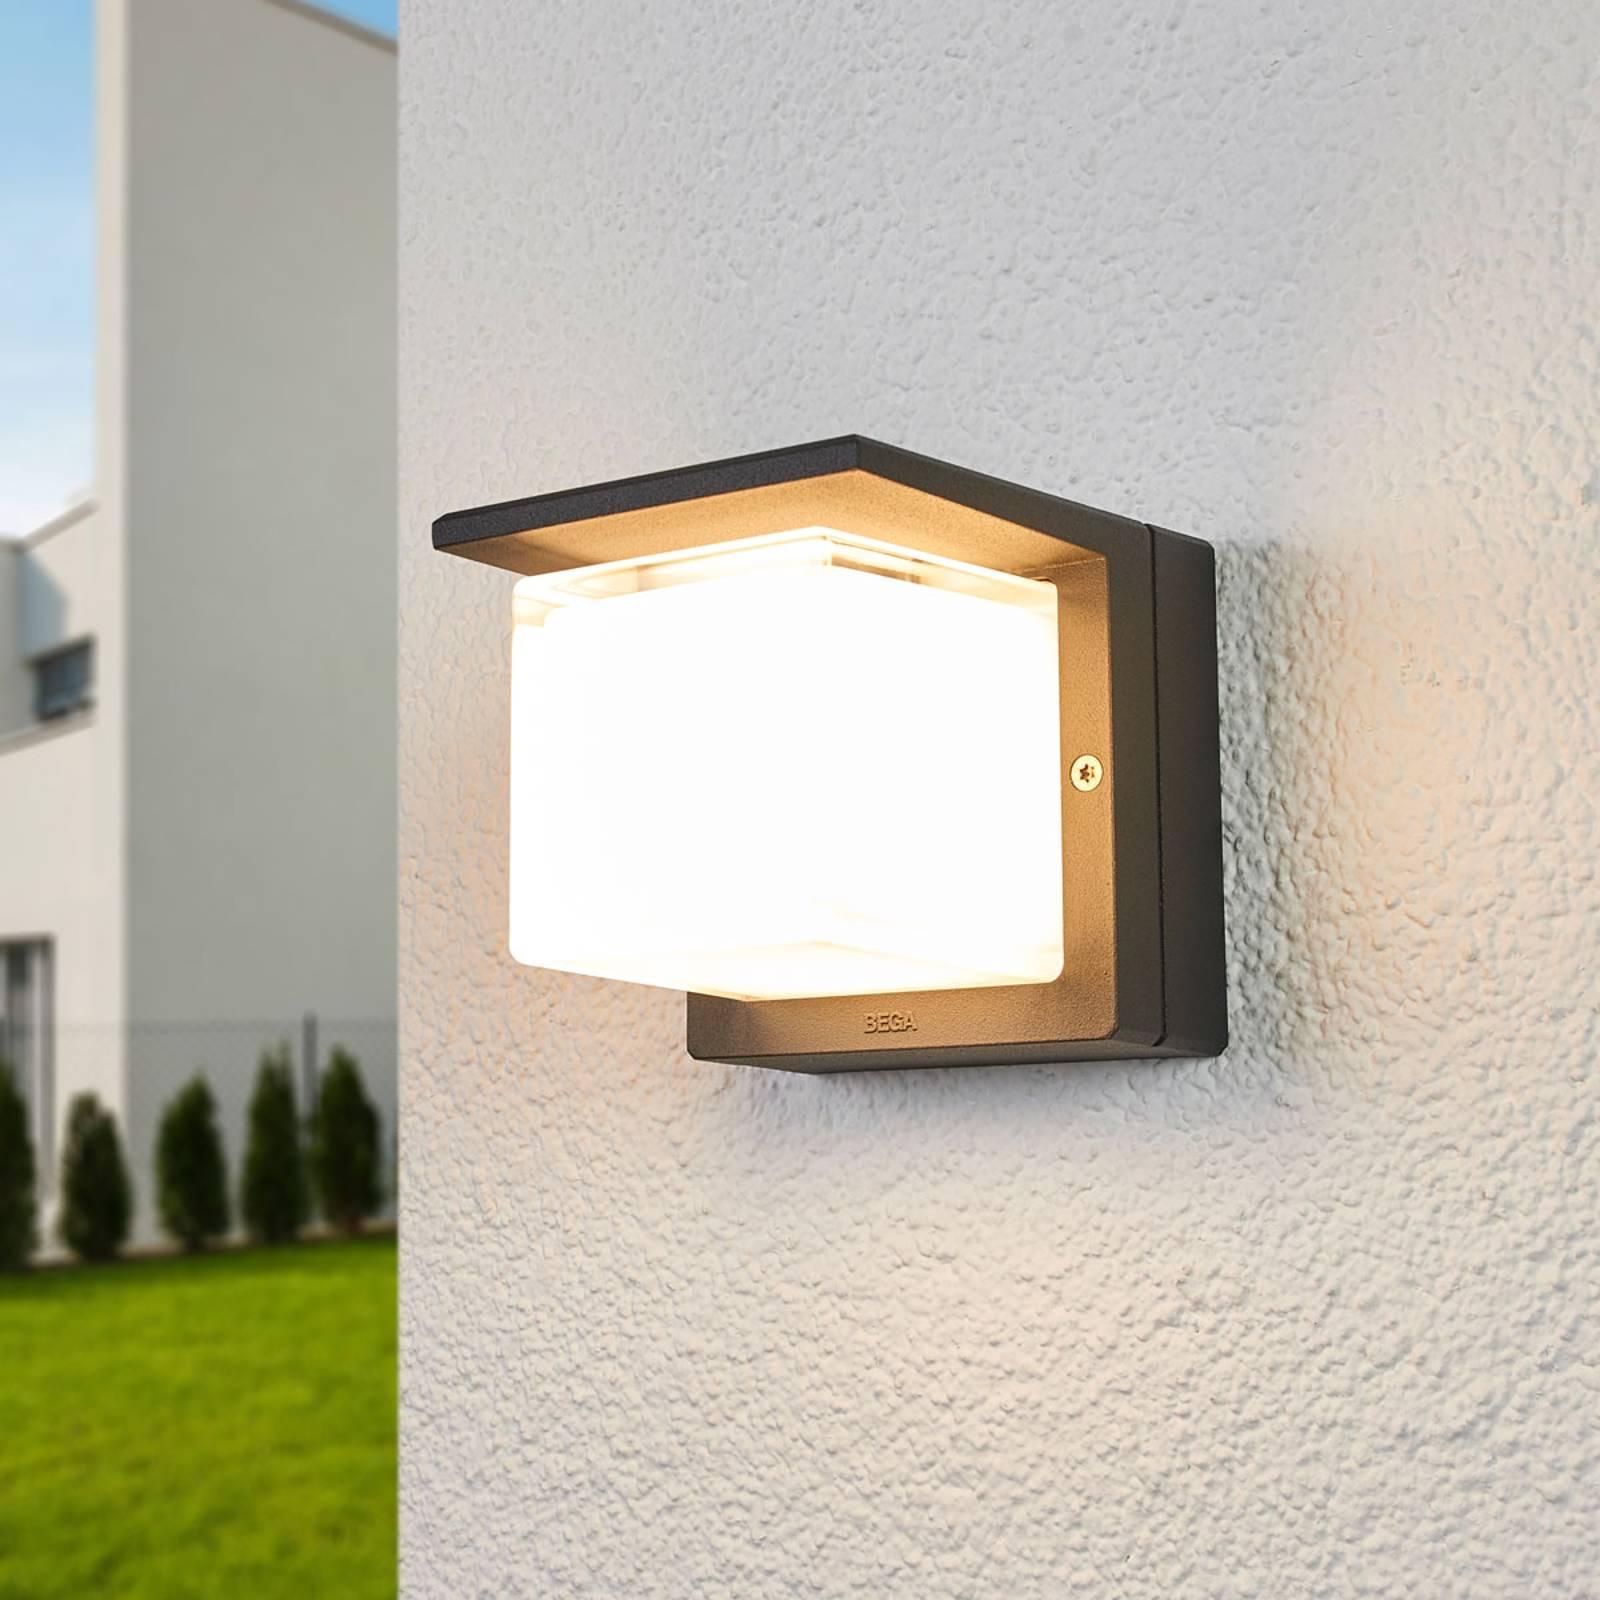 Lampen von Bega bei I-Love-Tec.de